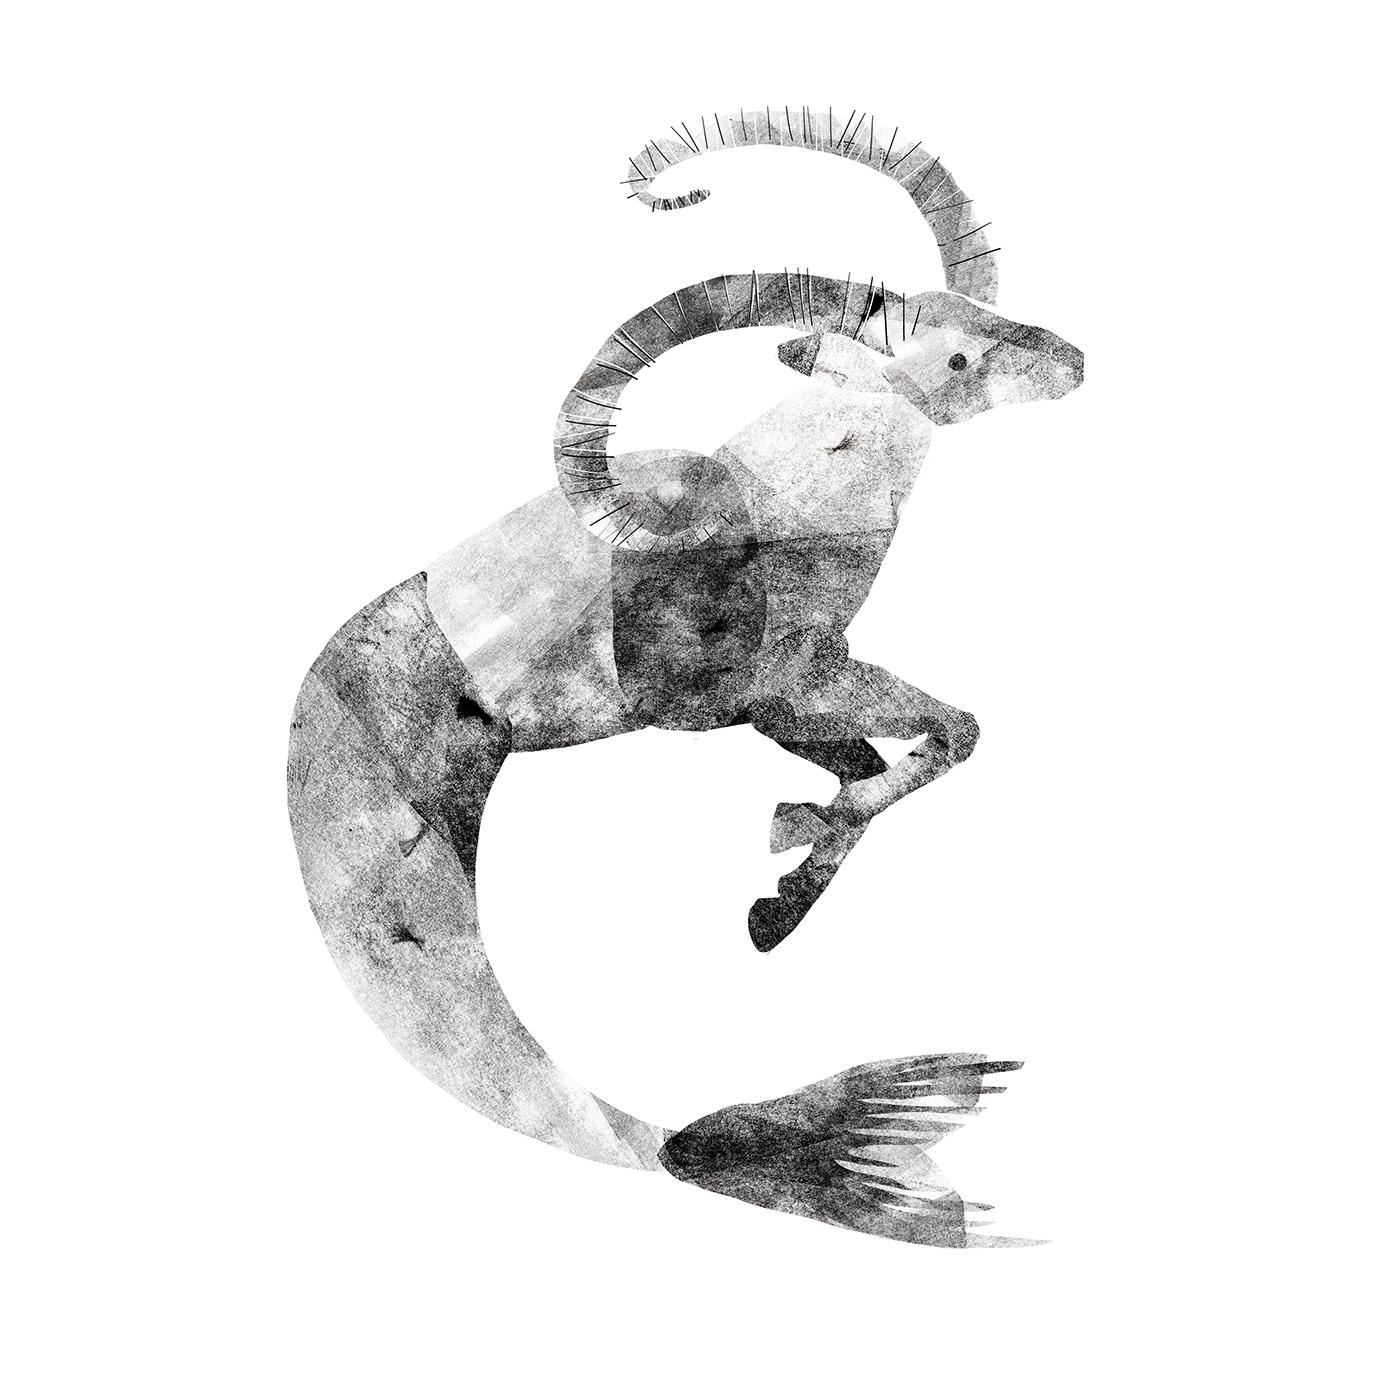 zodiac sign texture collage design Horoscope inspiration journal oroscopo stars